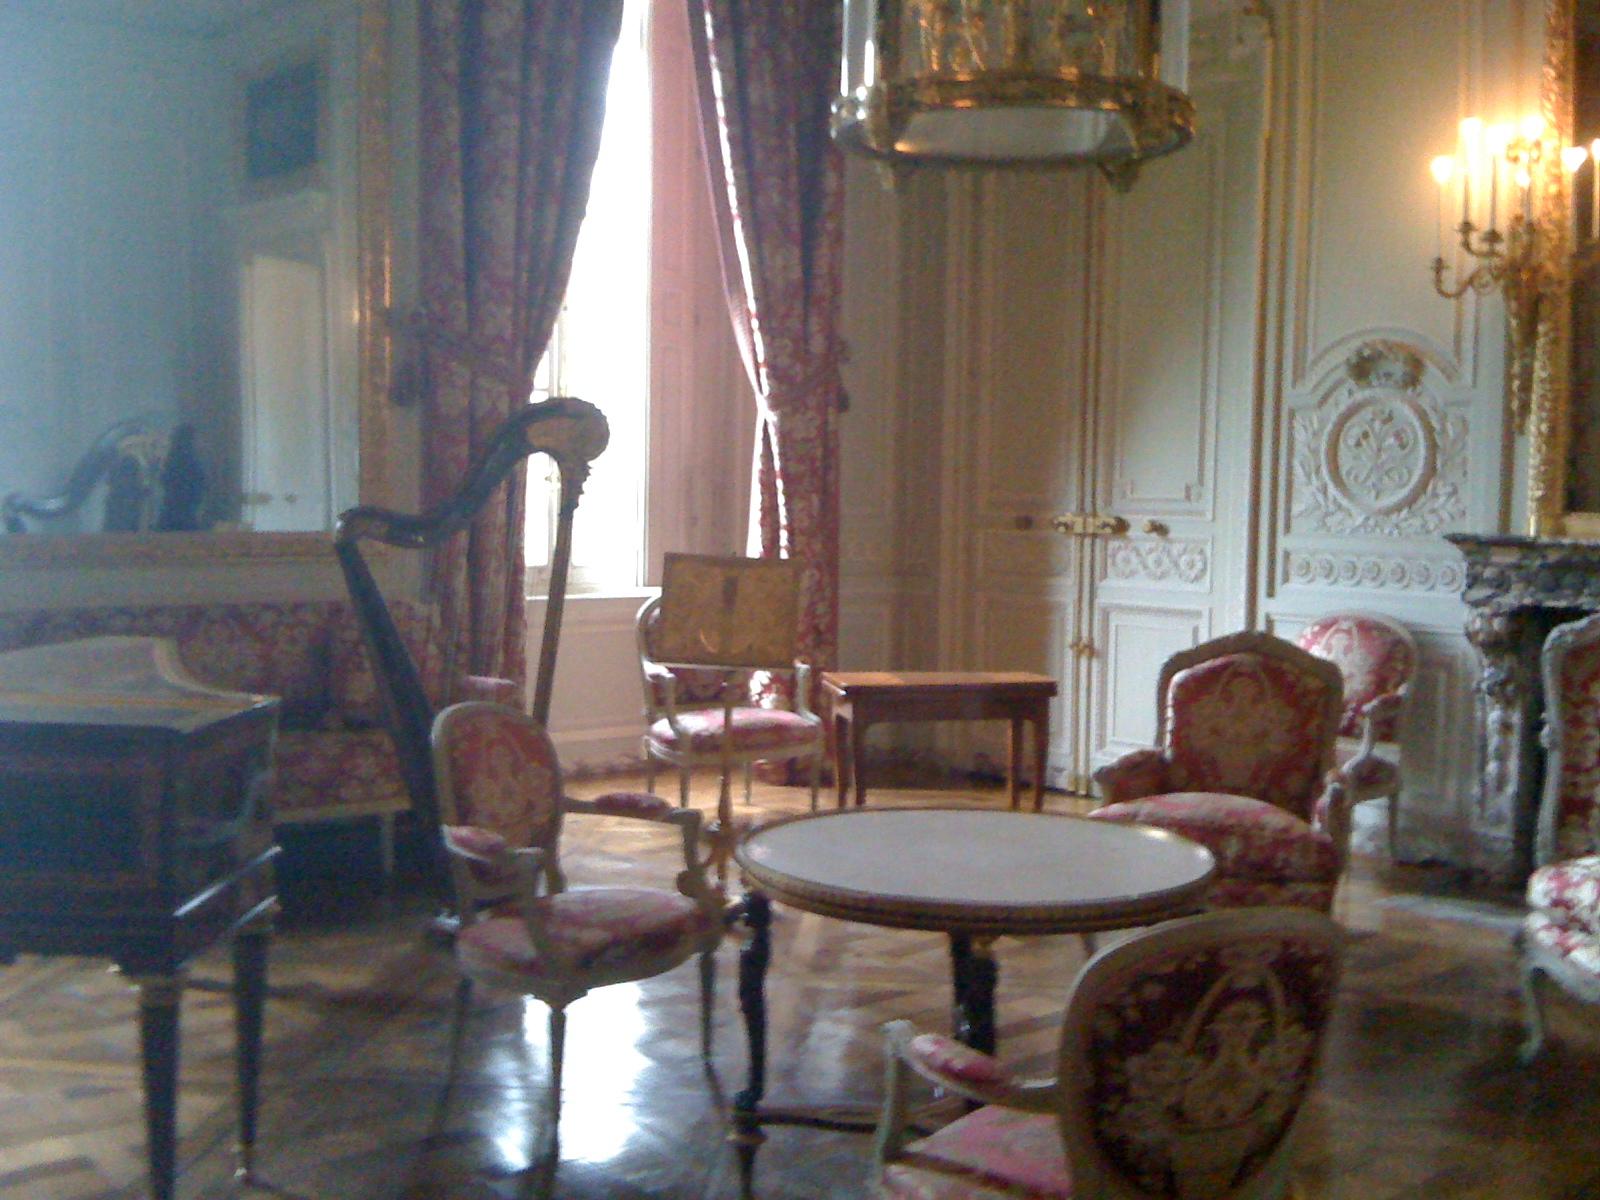 Camera Da Letto Stile Parigi : Hotel a parigi ibis styles parigi bercy